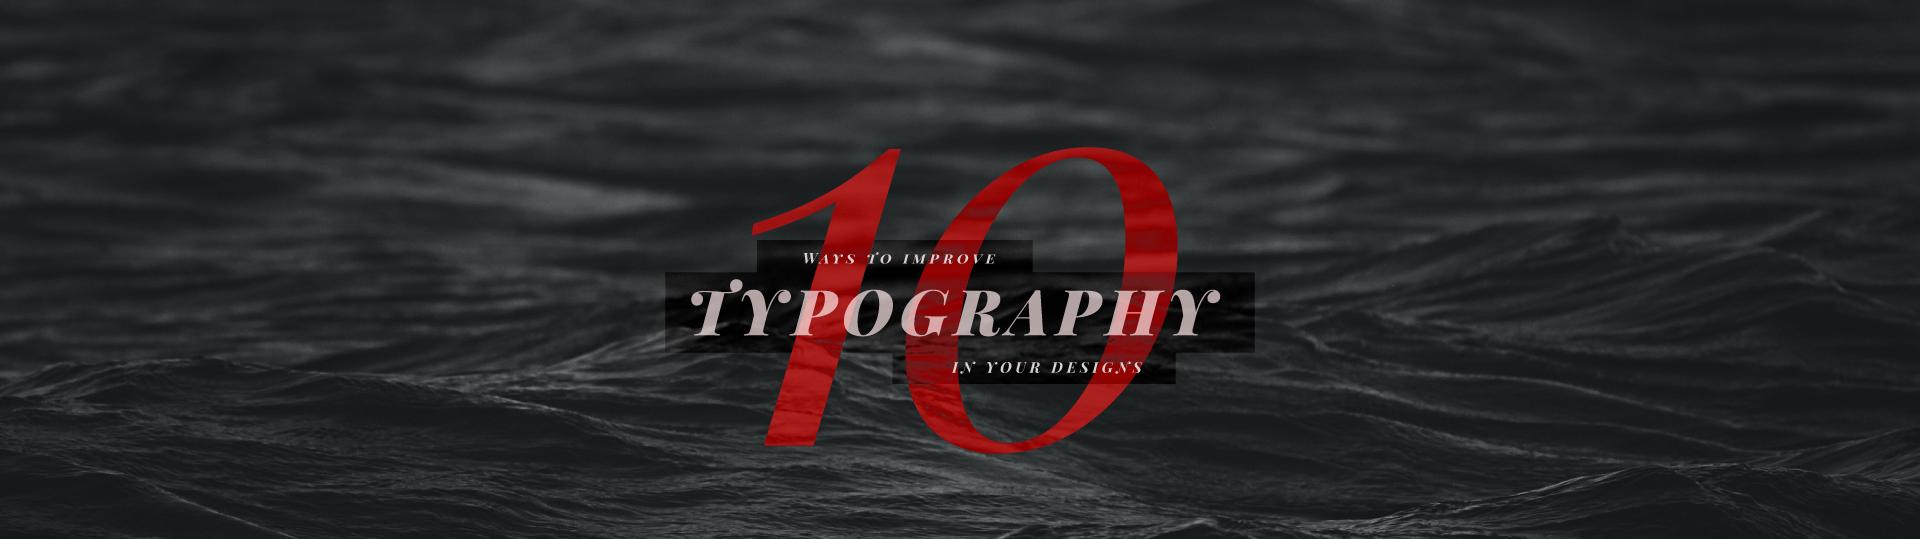 10waystoimprovetypographyinyourdesigns_R04